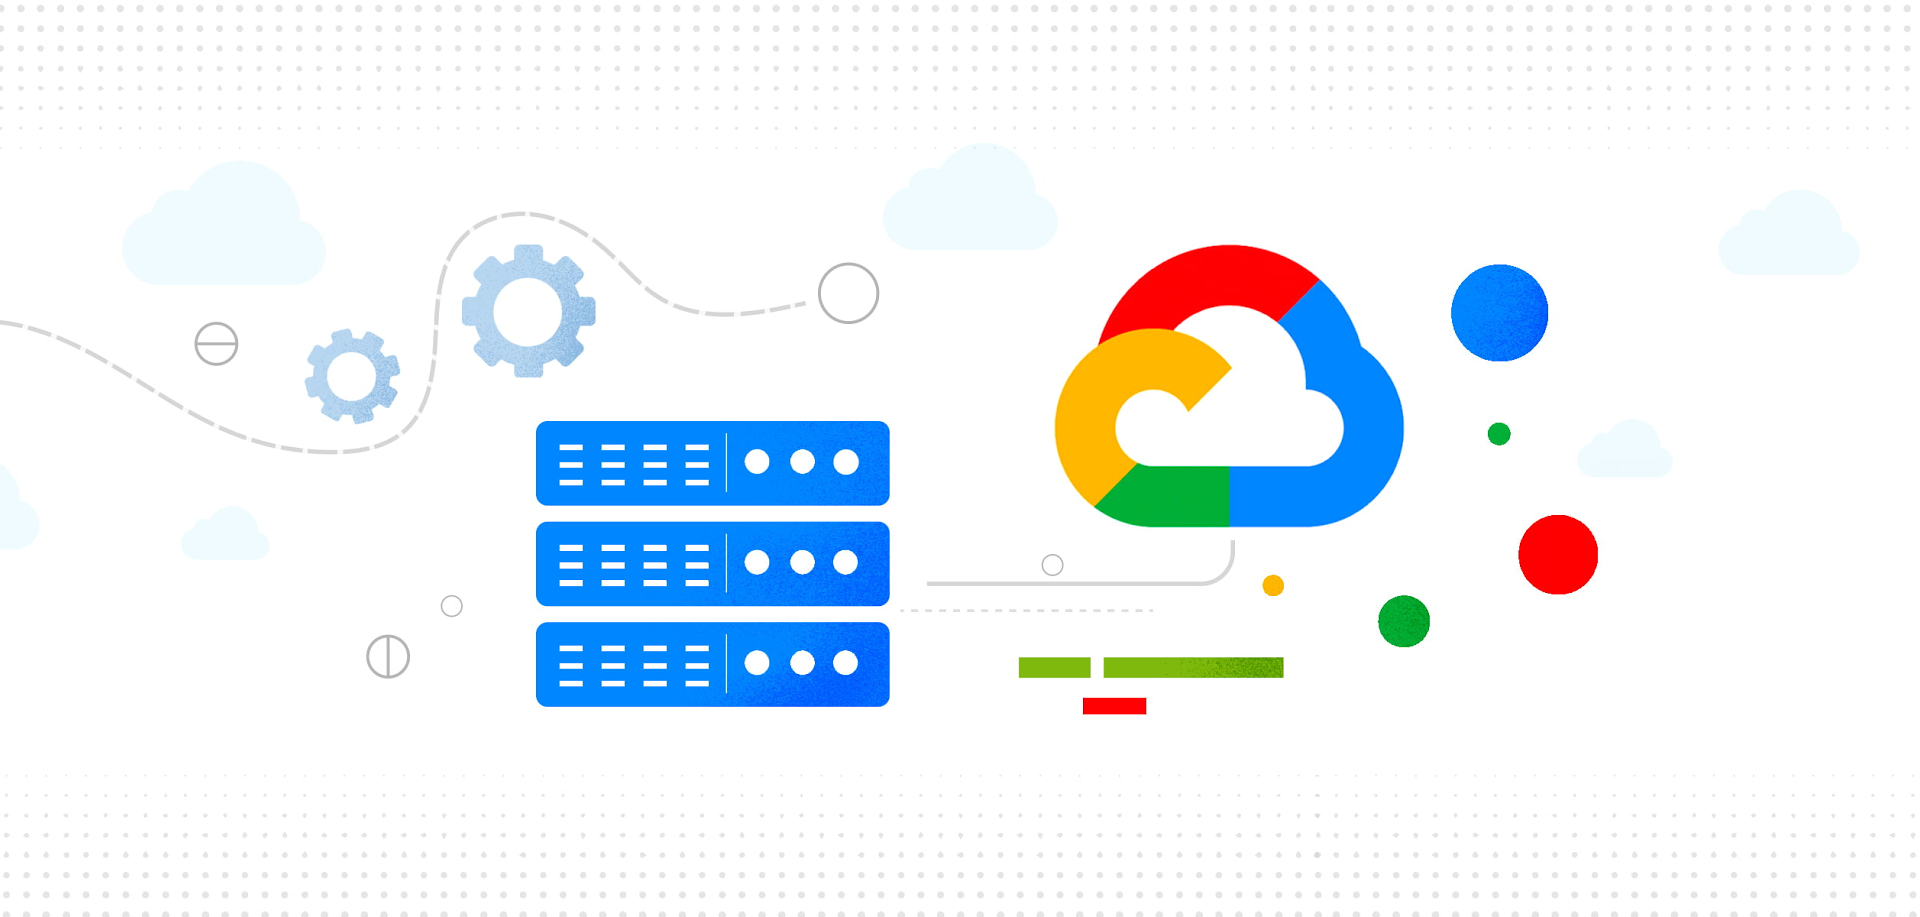 Google Cloud - Hybrid Cloud